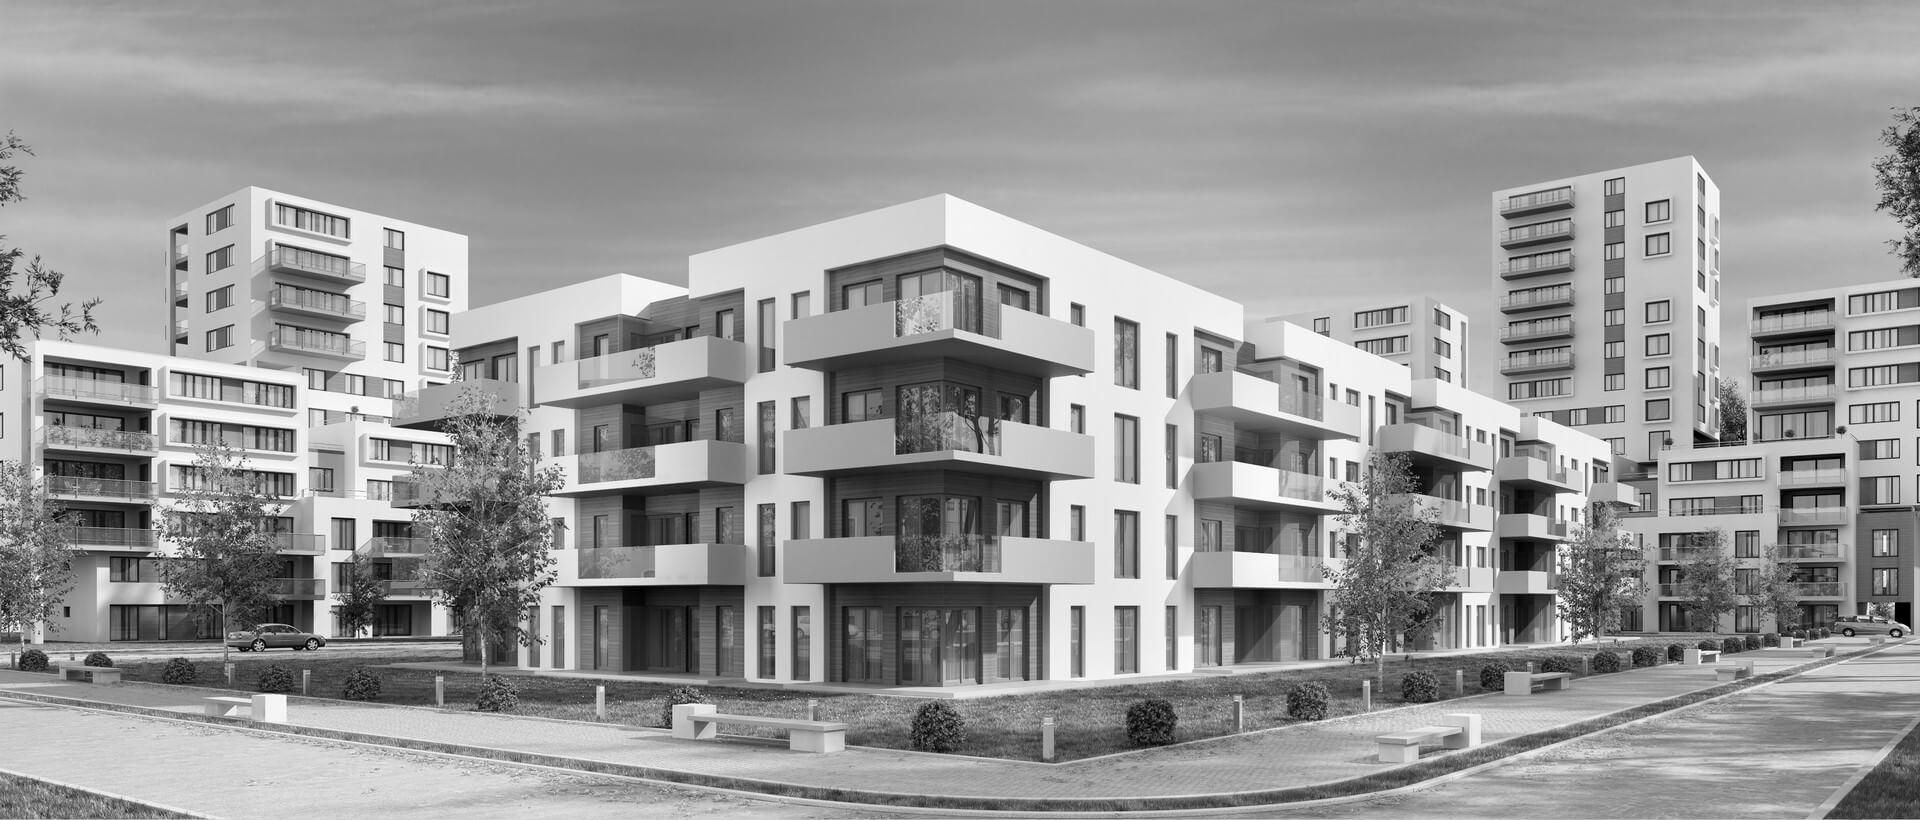 stavebna-spolocnost-tbau-hruba-stavba-stavebne-prace